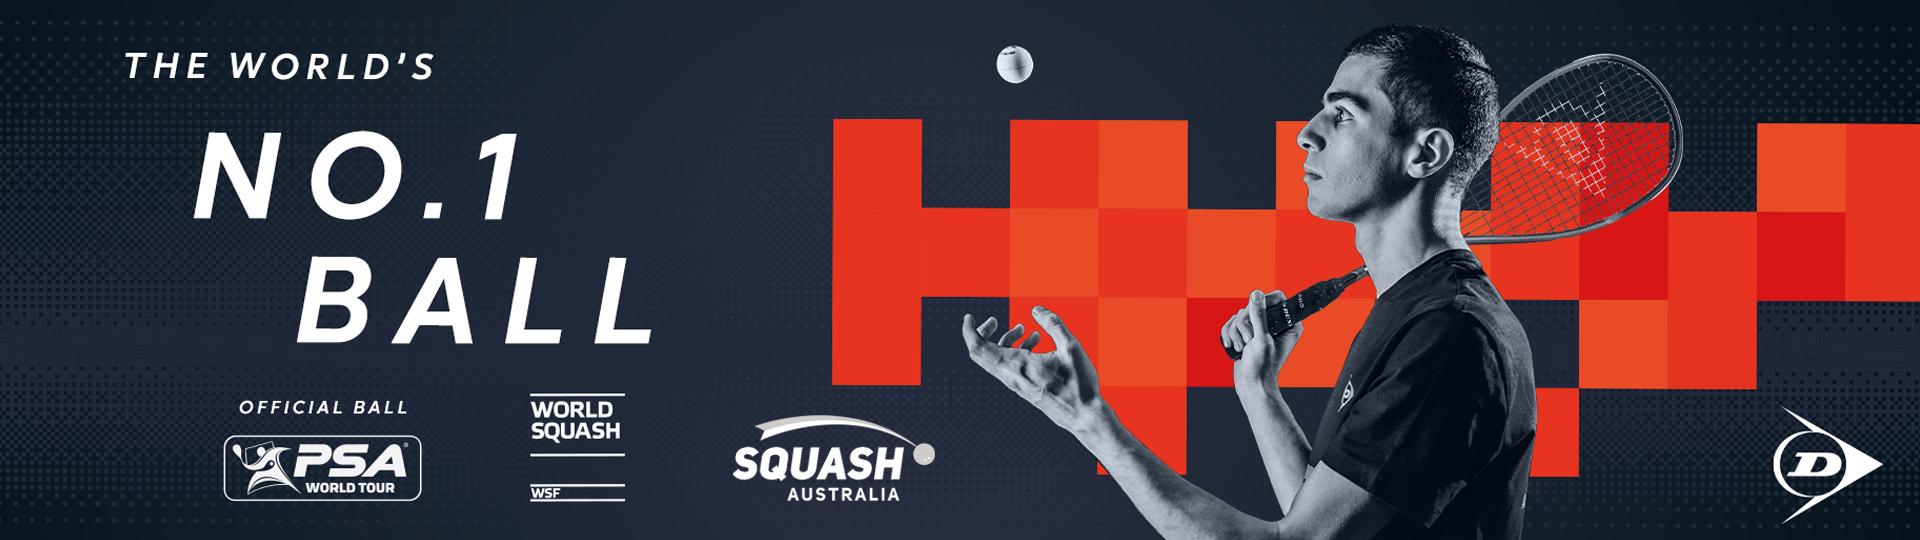 2021-dunlop-squash-balls-australia.jpg